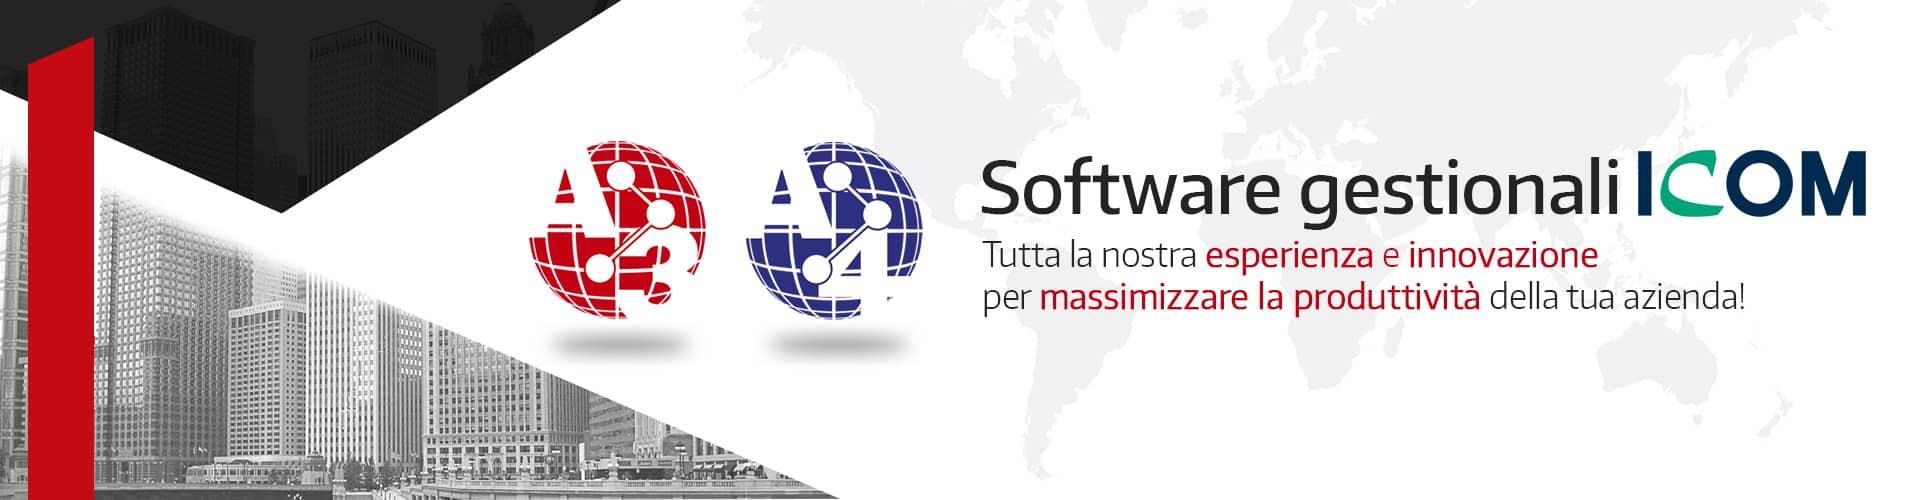 slide software gestionali icom